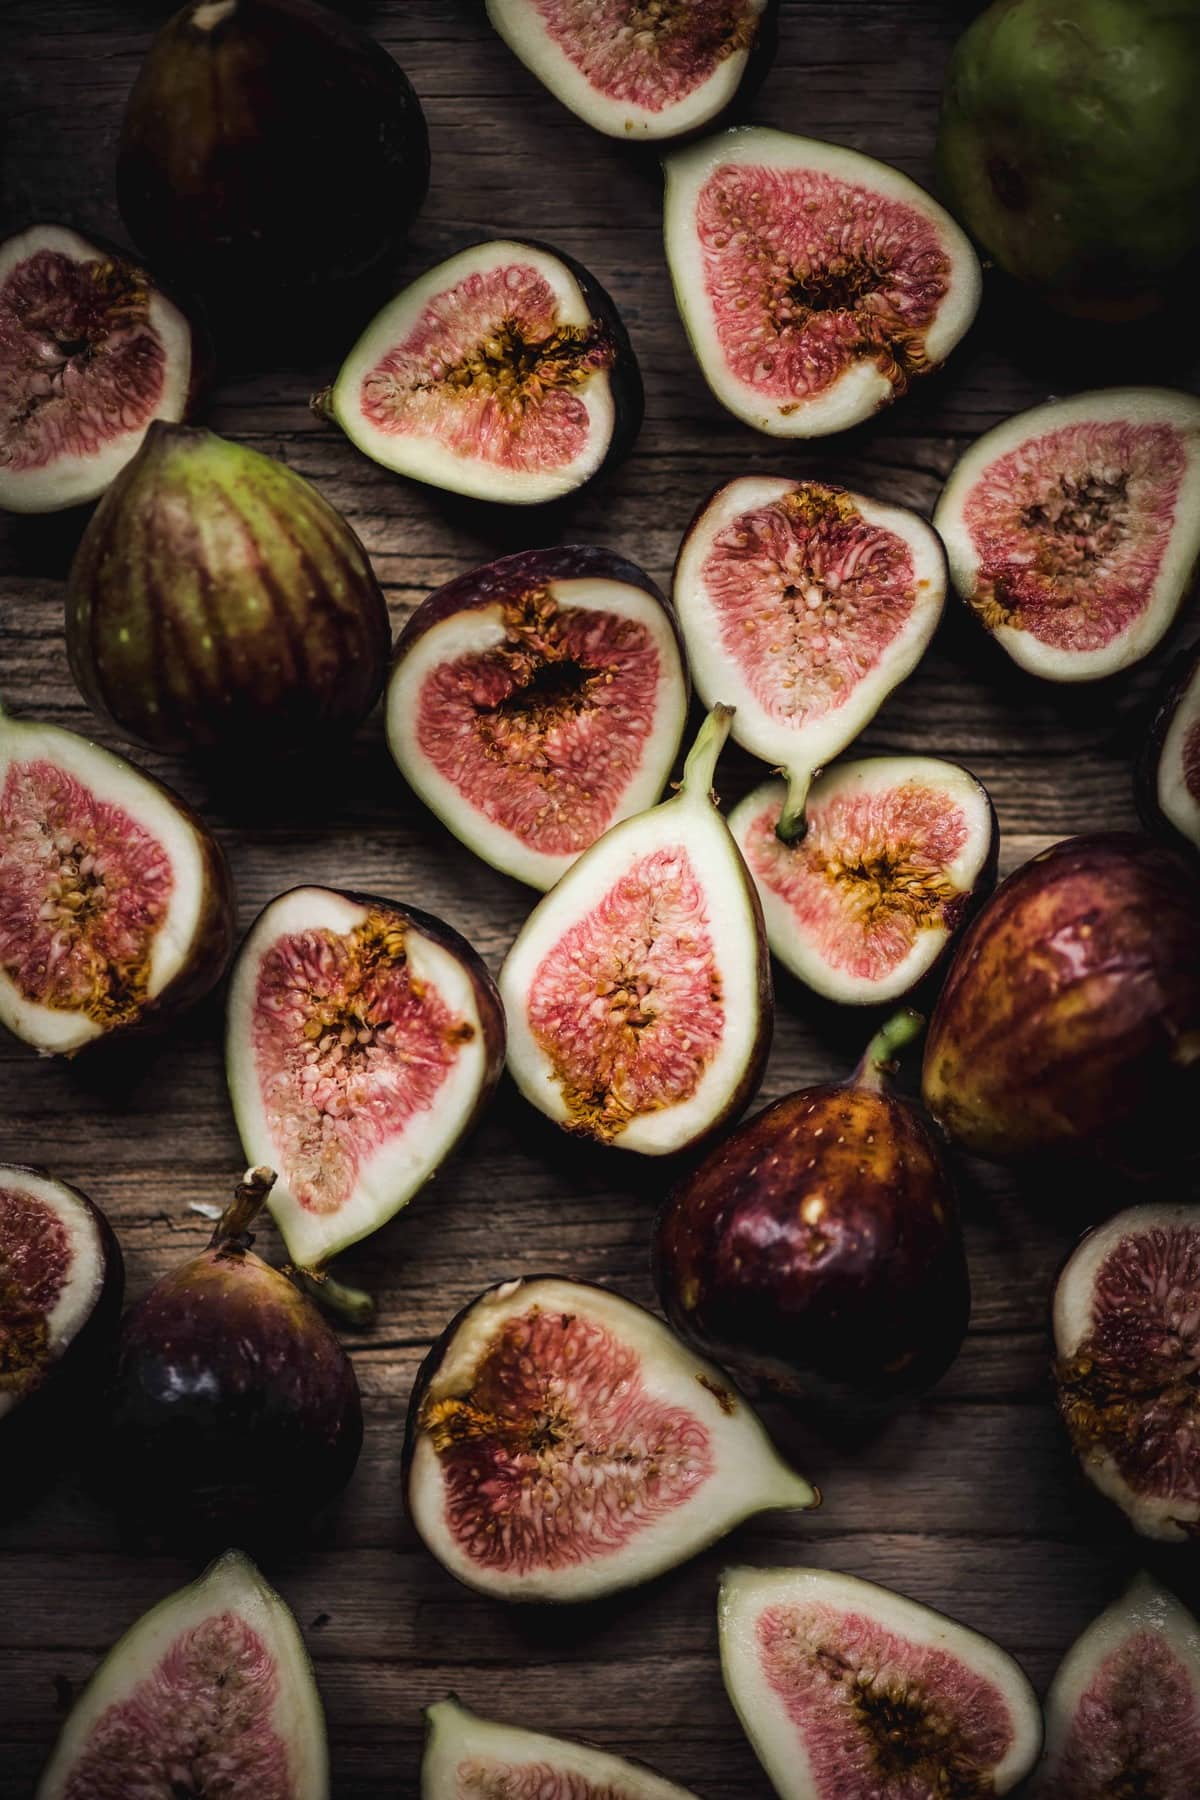 Overhead view of beautiful fresh figs